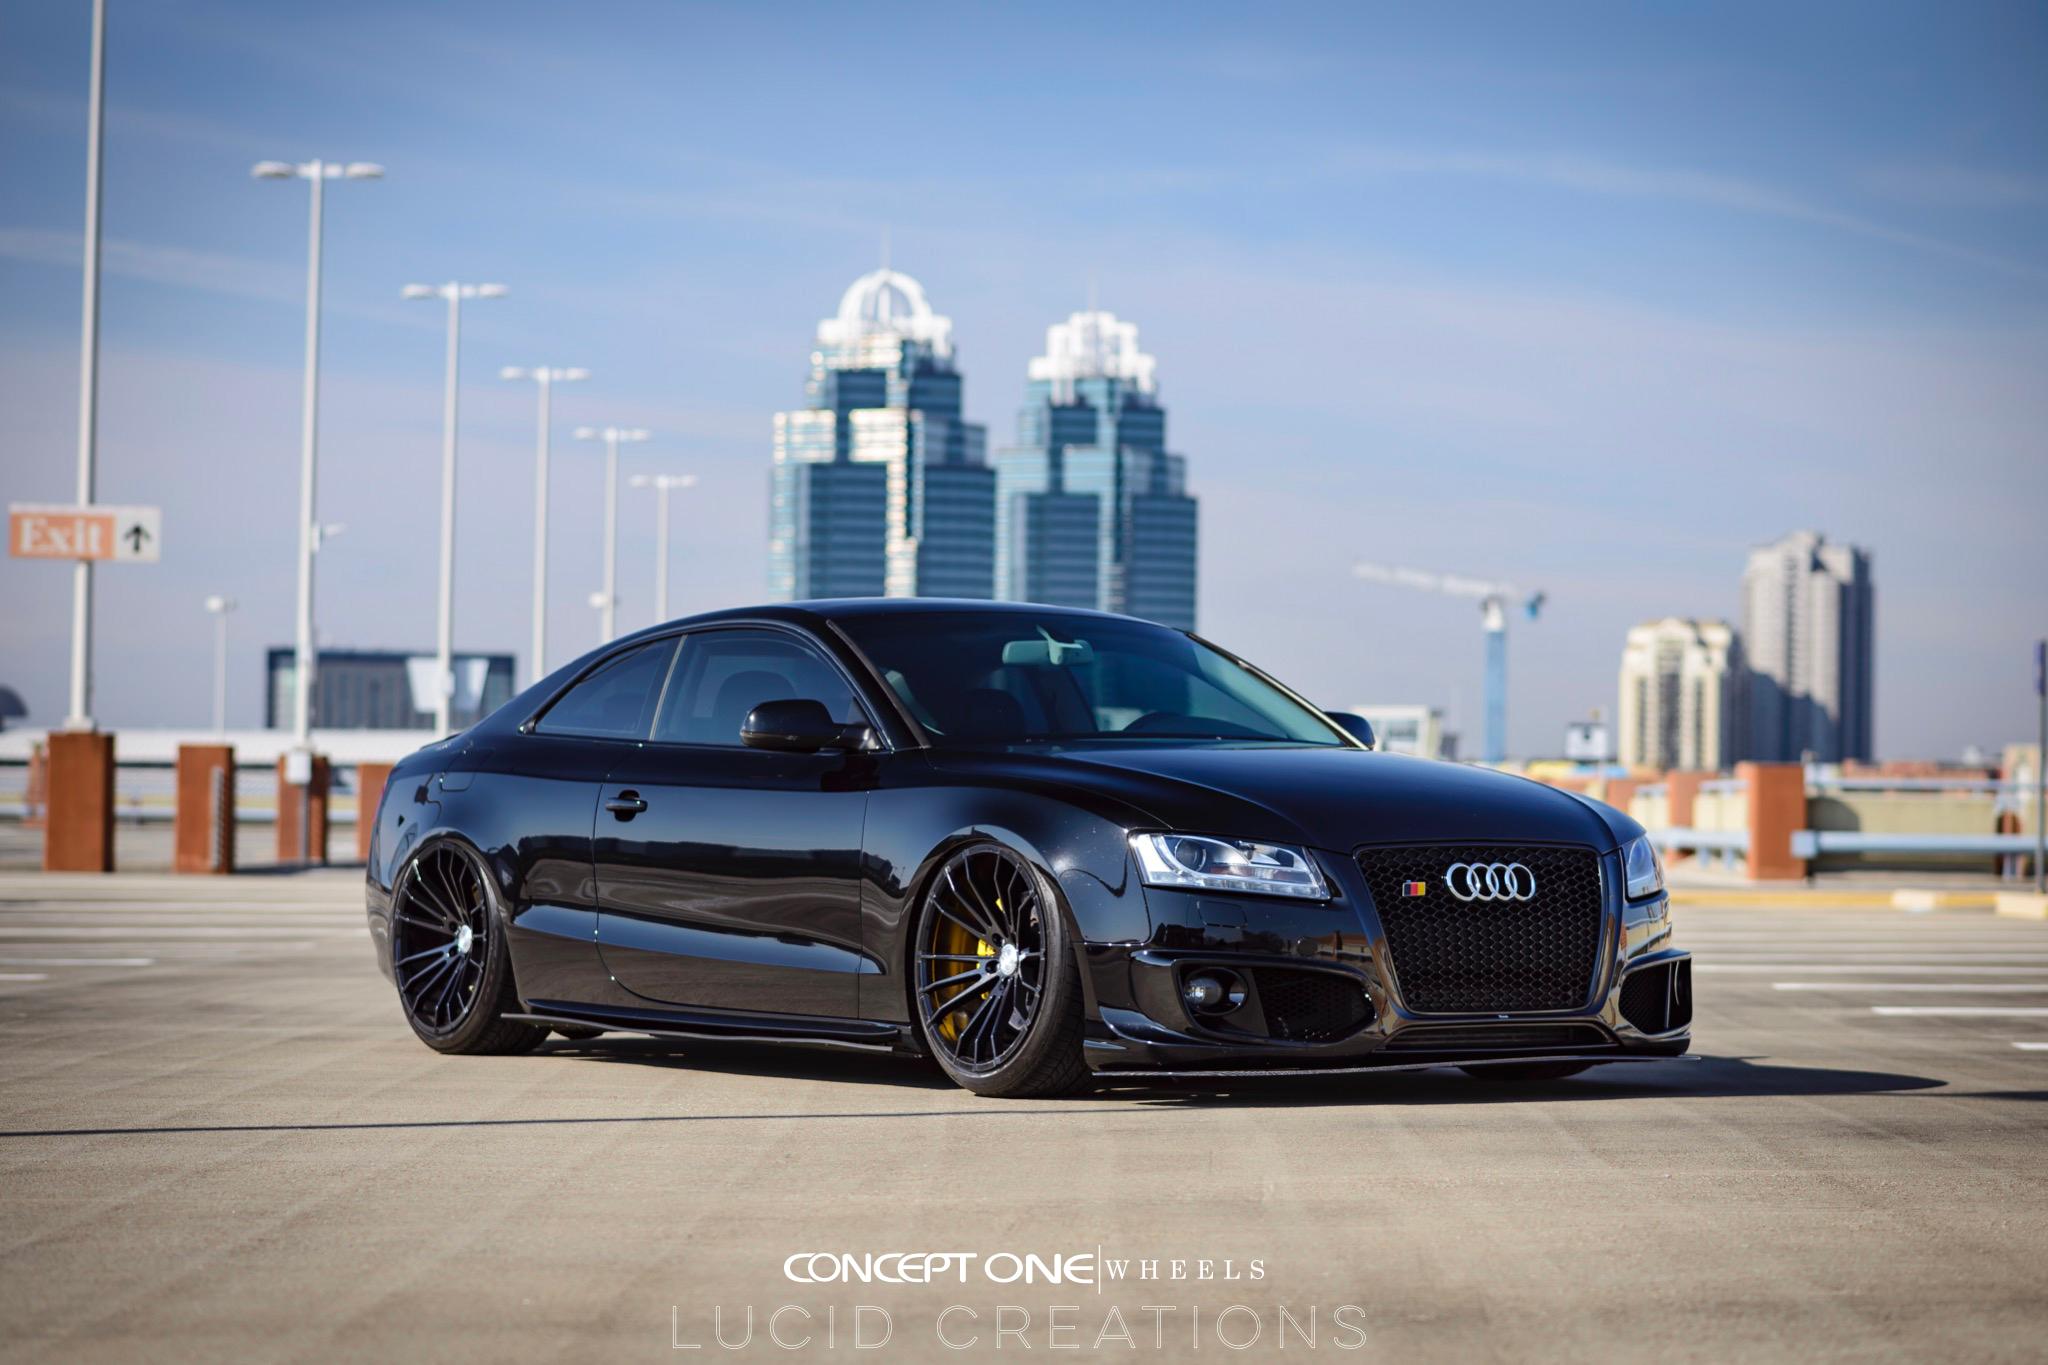 Audi A5 Csm 001 Concept One Wheels Usa